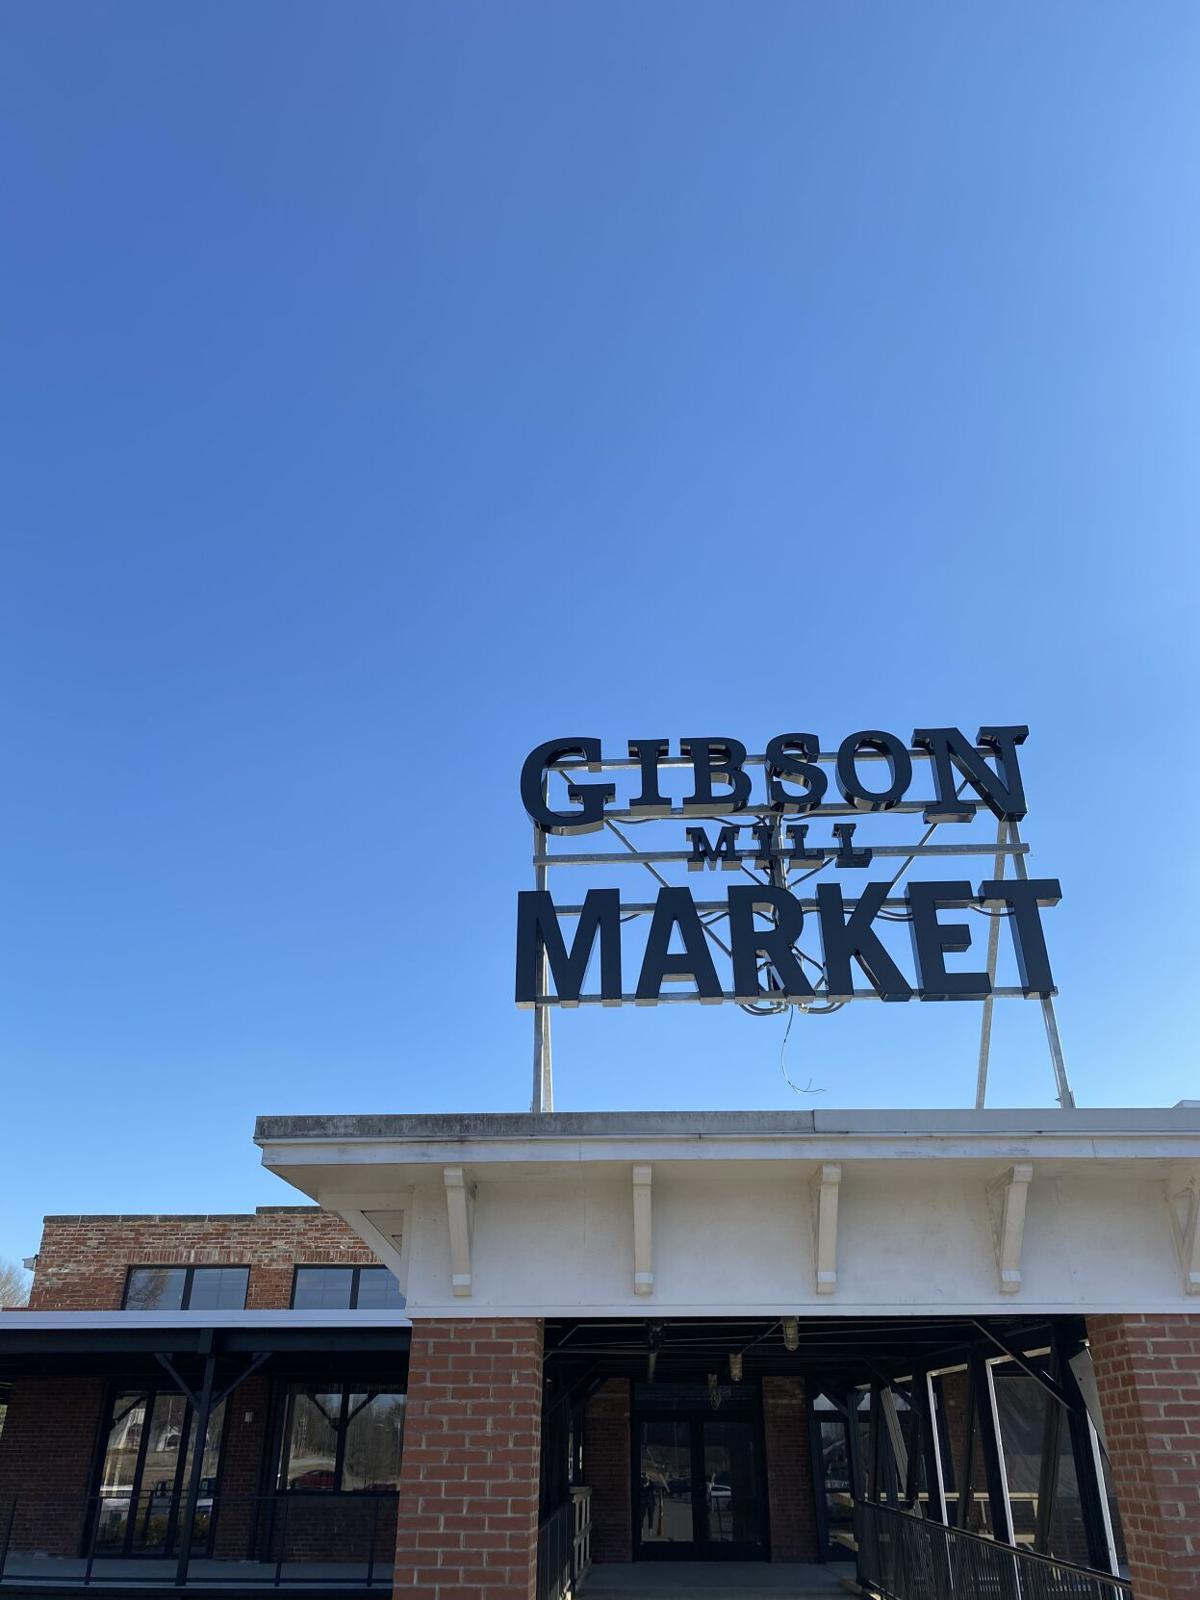 Gibson Mill Market